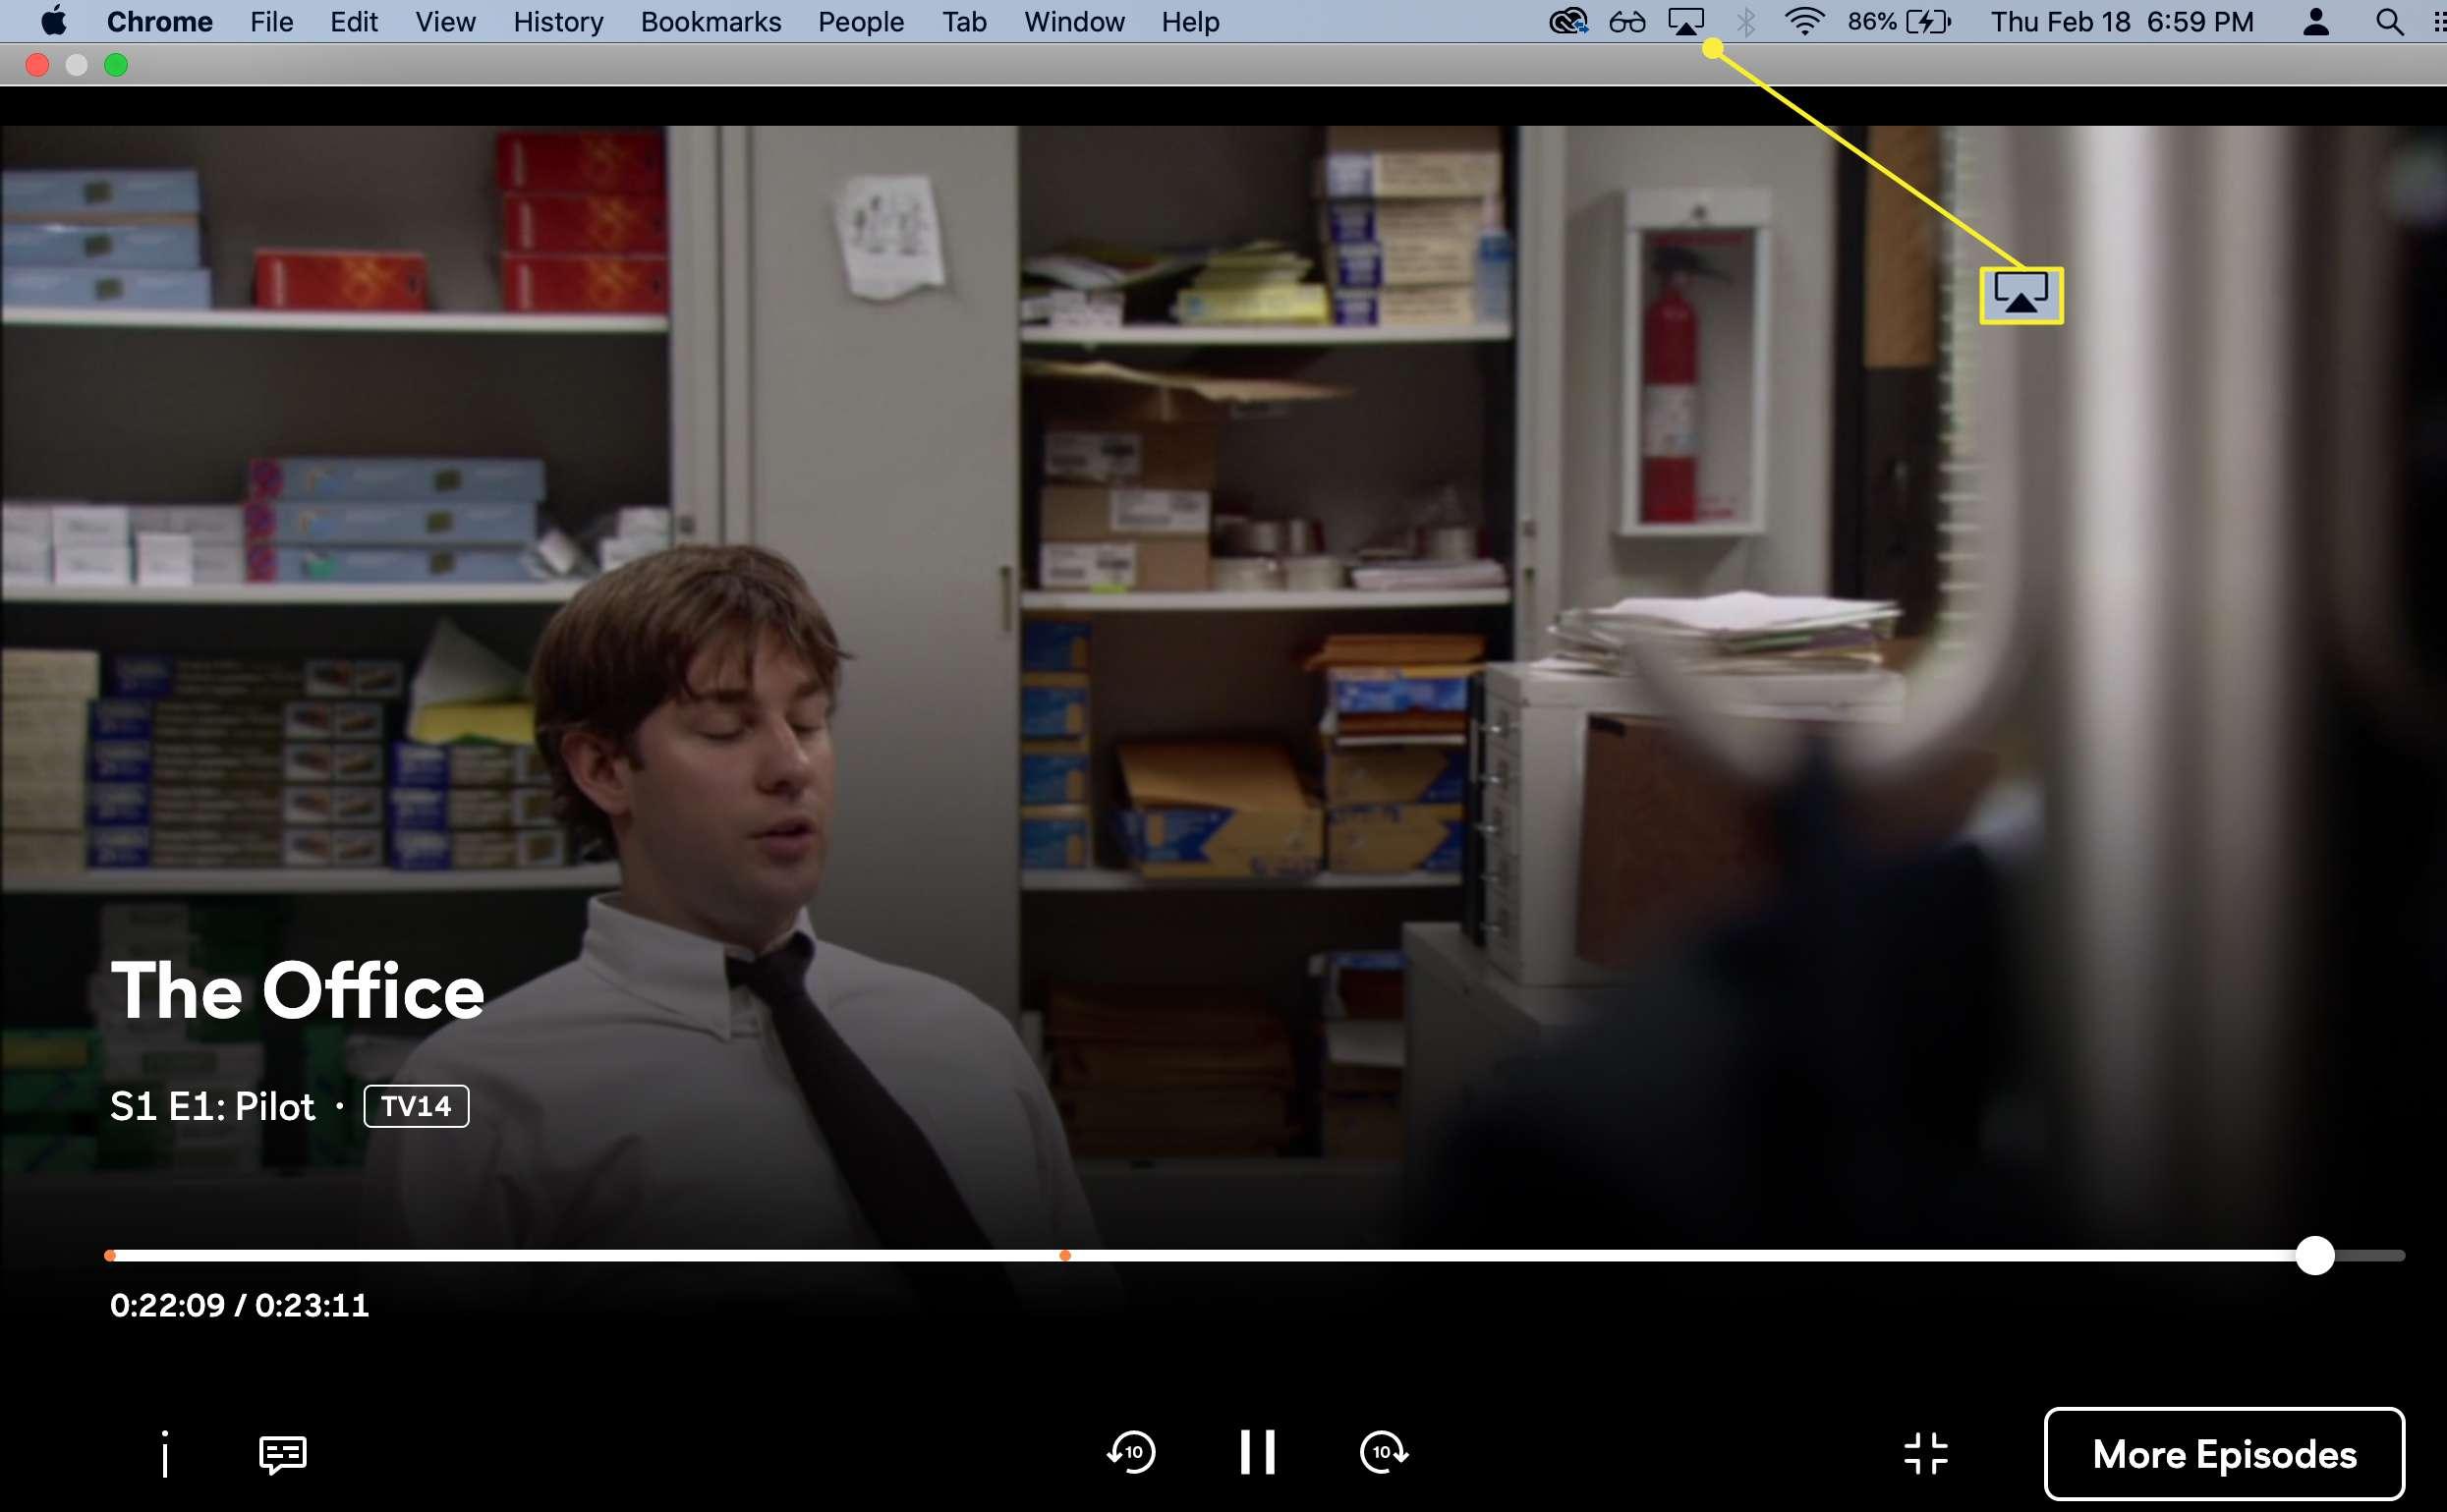 AirPlay icon highlighted on Mac menu bar